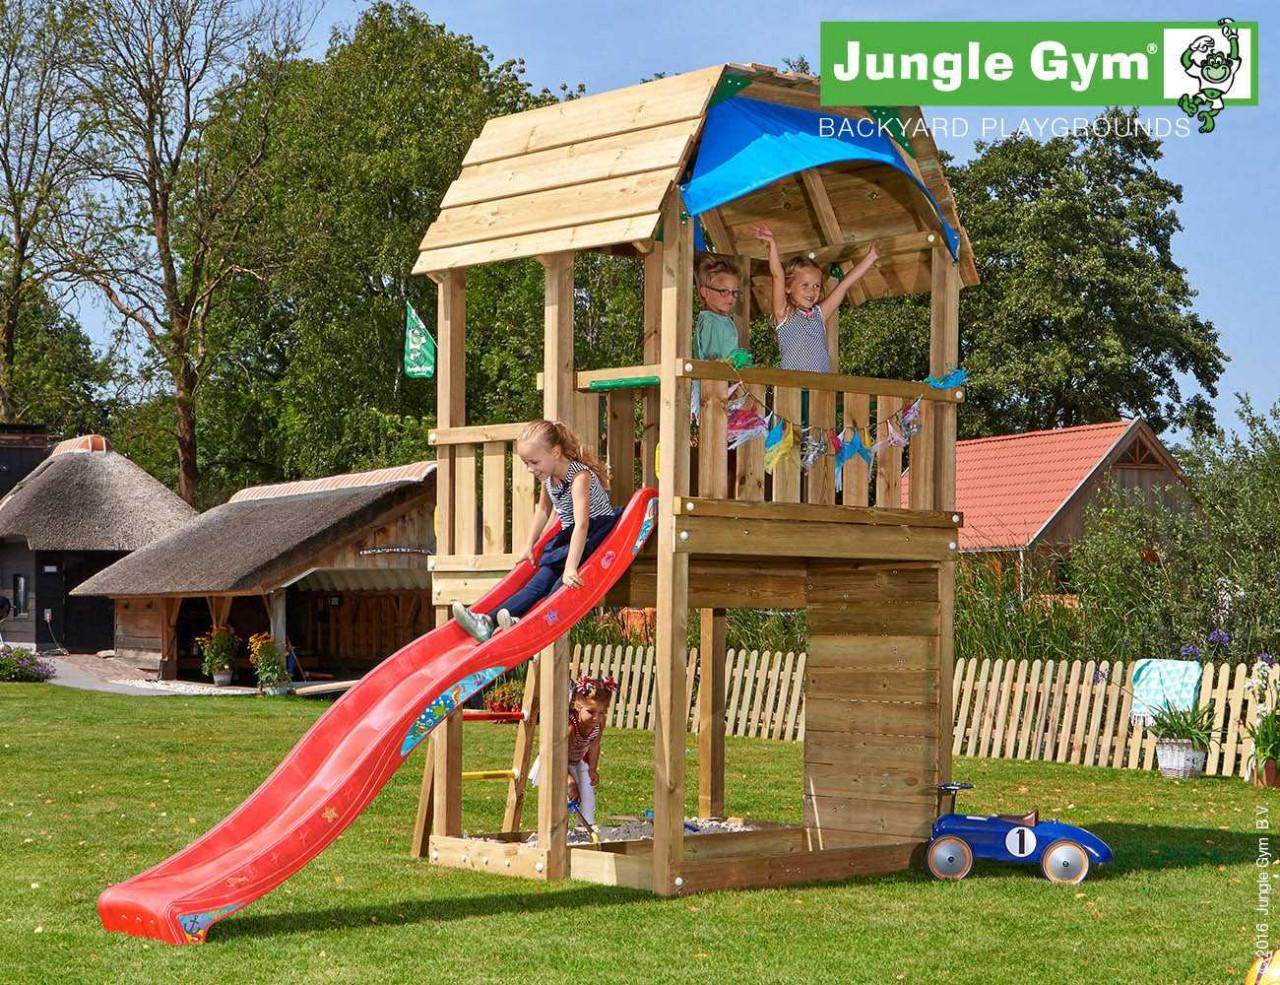 Klettergerüst Jungle Gym : Jungle gym klettergerüst barn kostenloser versand holz